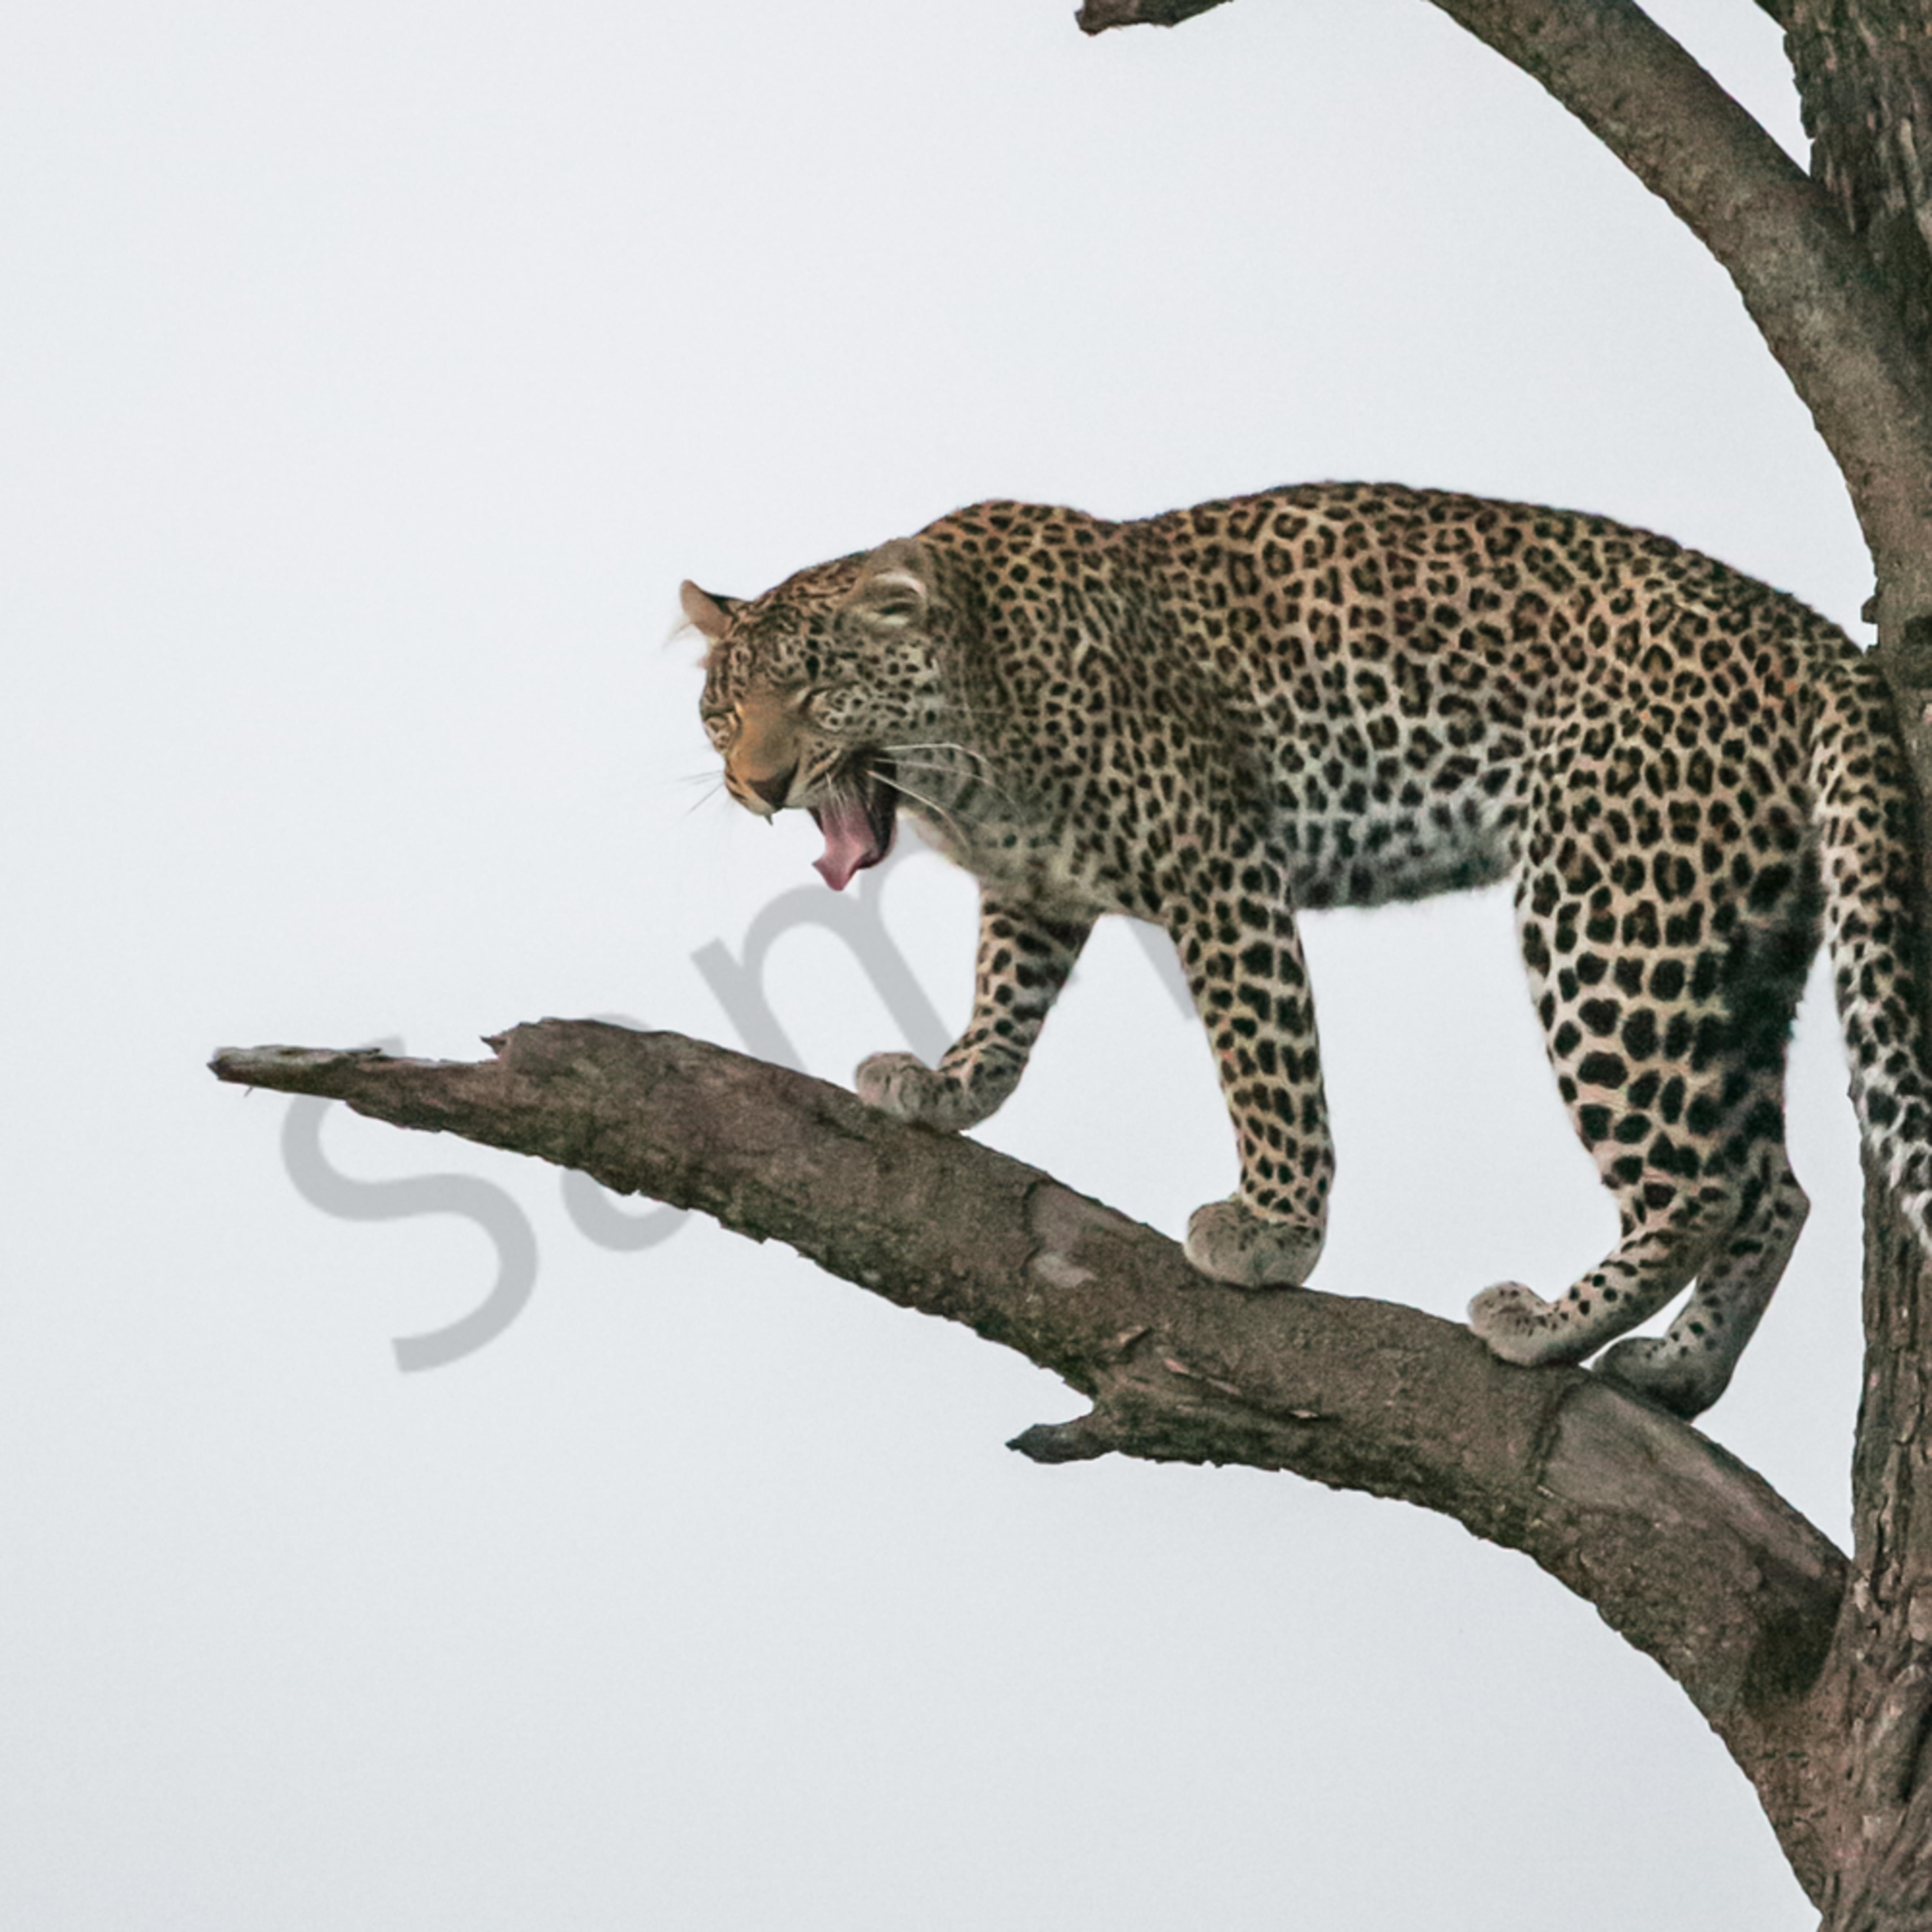 Screamingleopard d69jz5